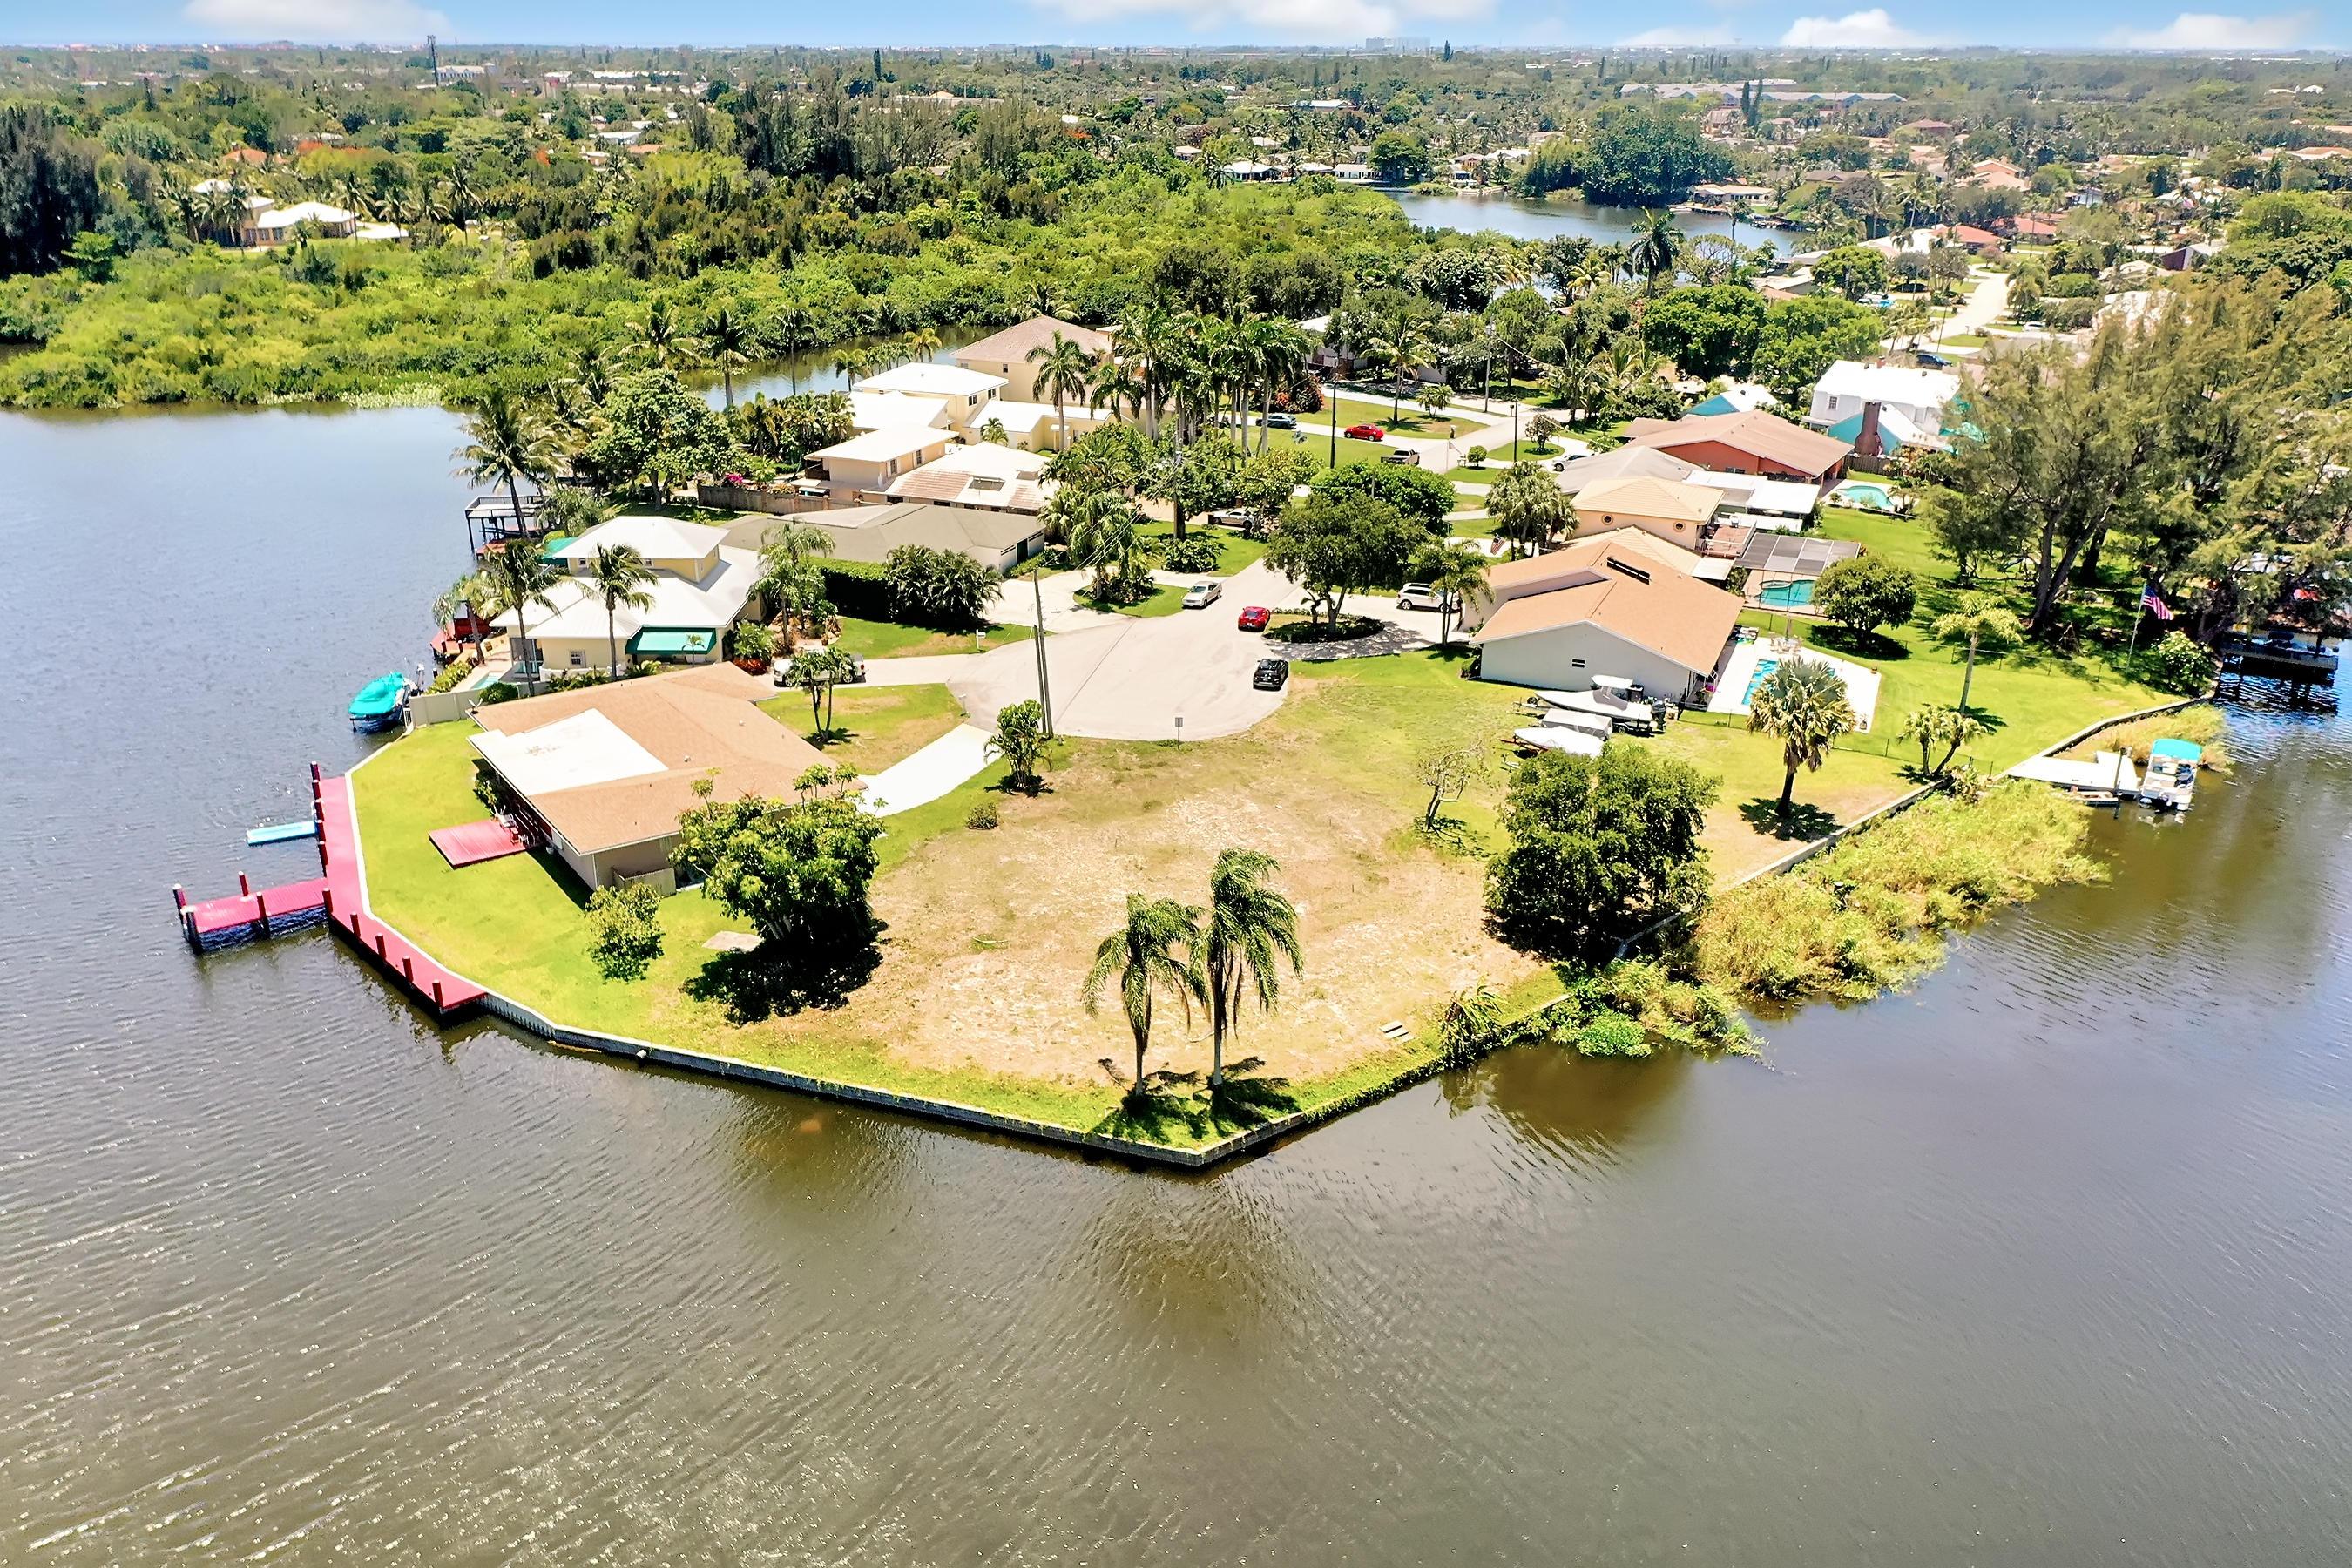 6519 Paul Mar Dr., Lake Worth, Florida 33462